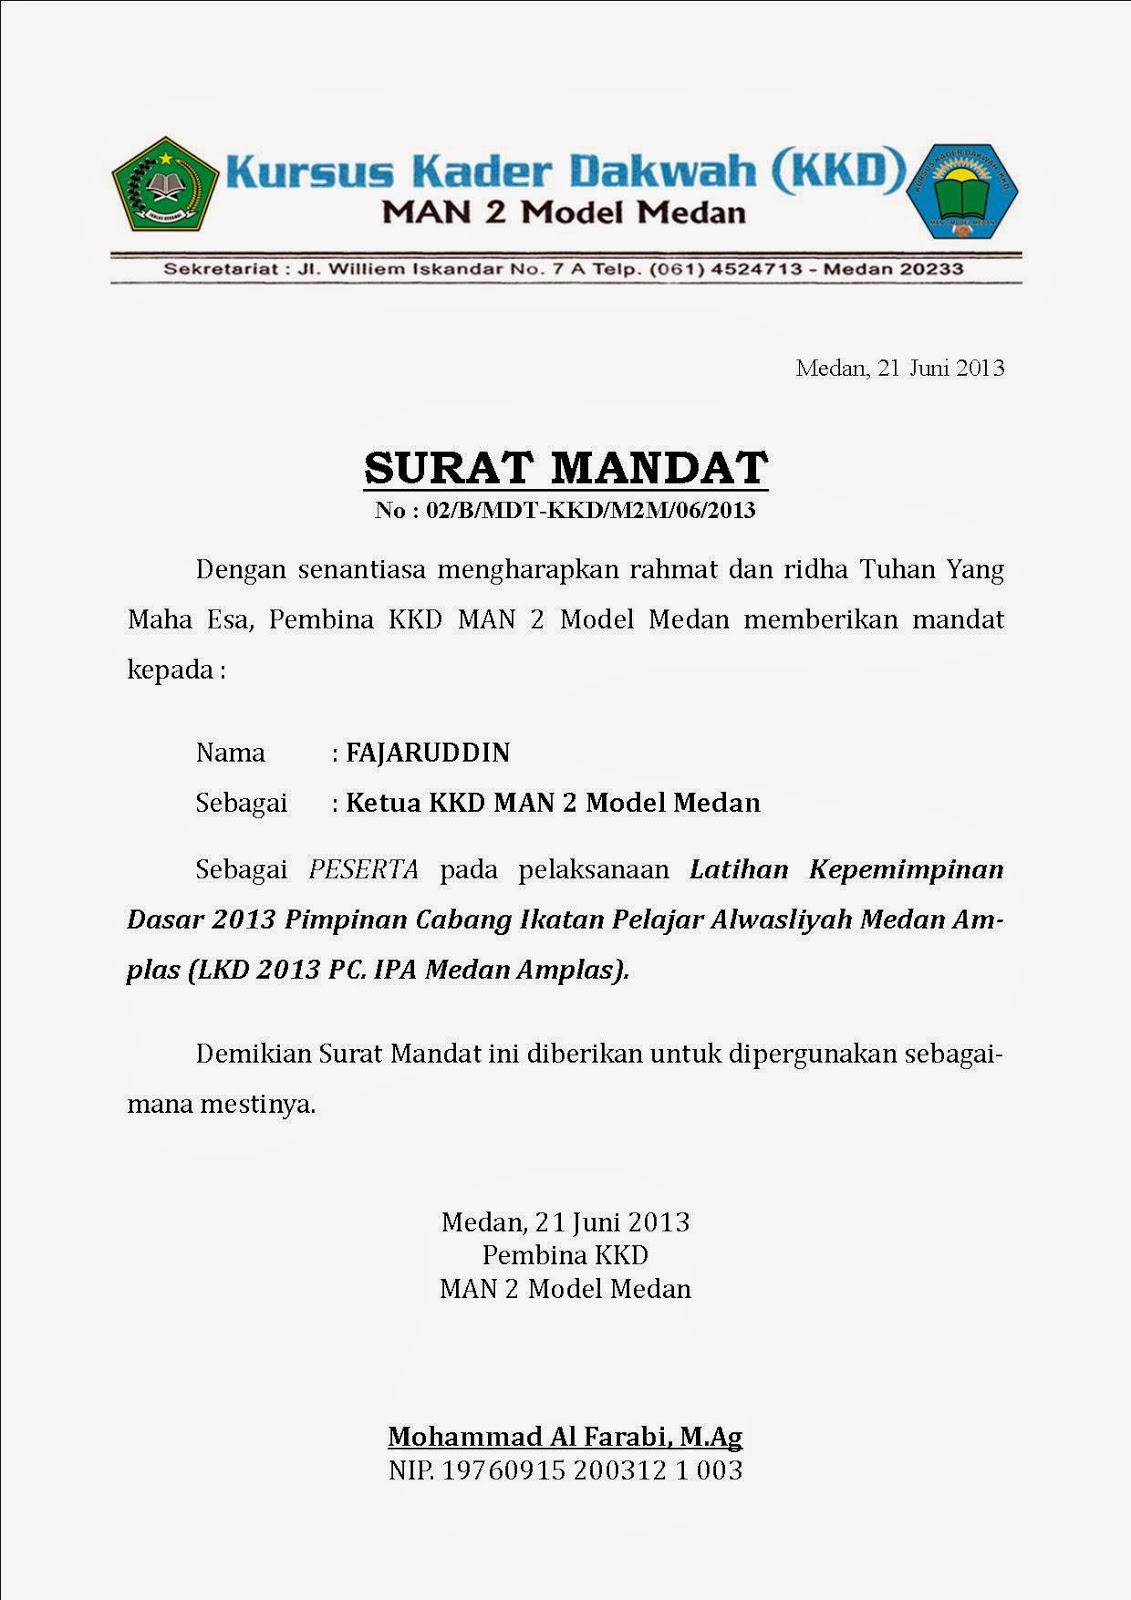 Contoh Surat Mandat : contoh, surat, mandat, Contoh, Surat, Mandat, Pramuka